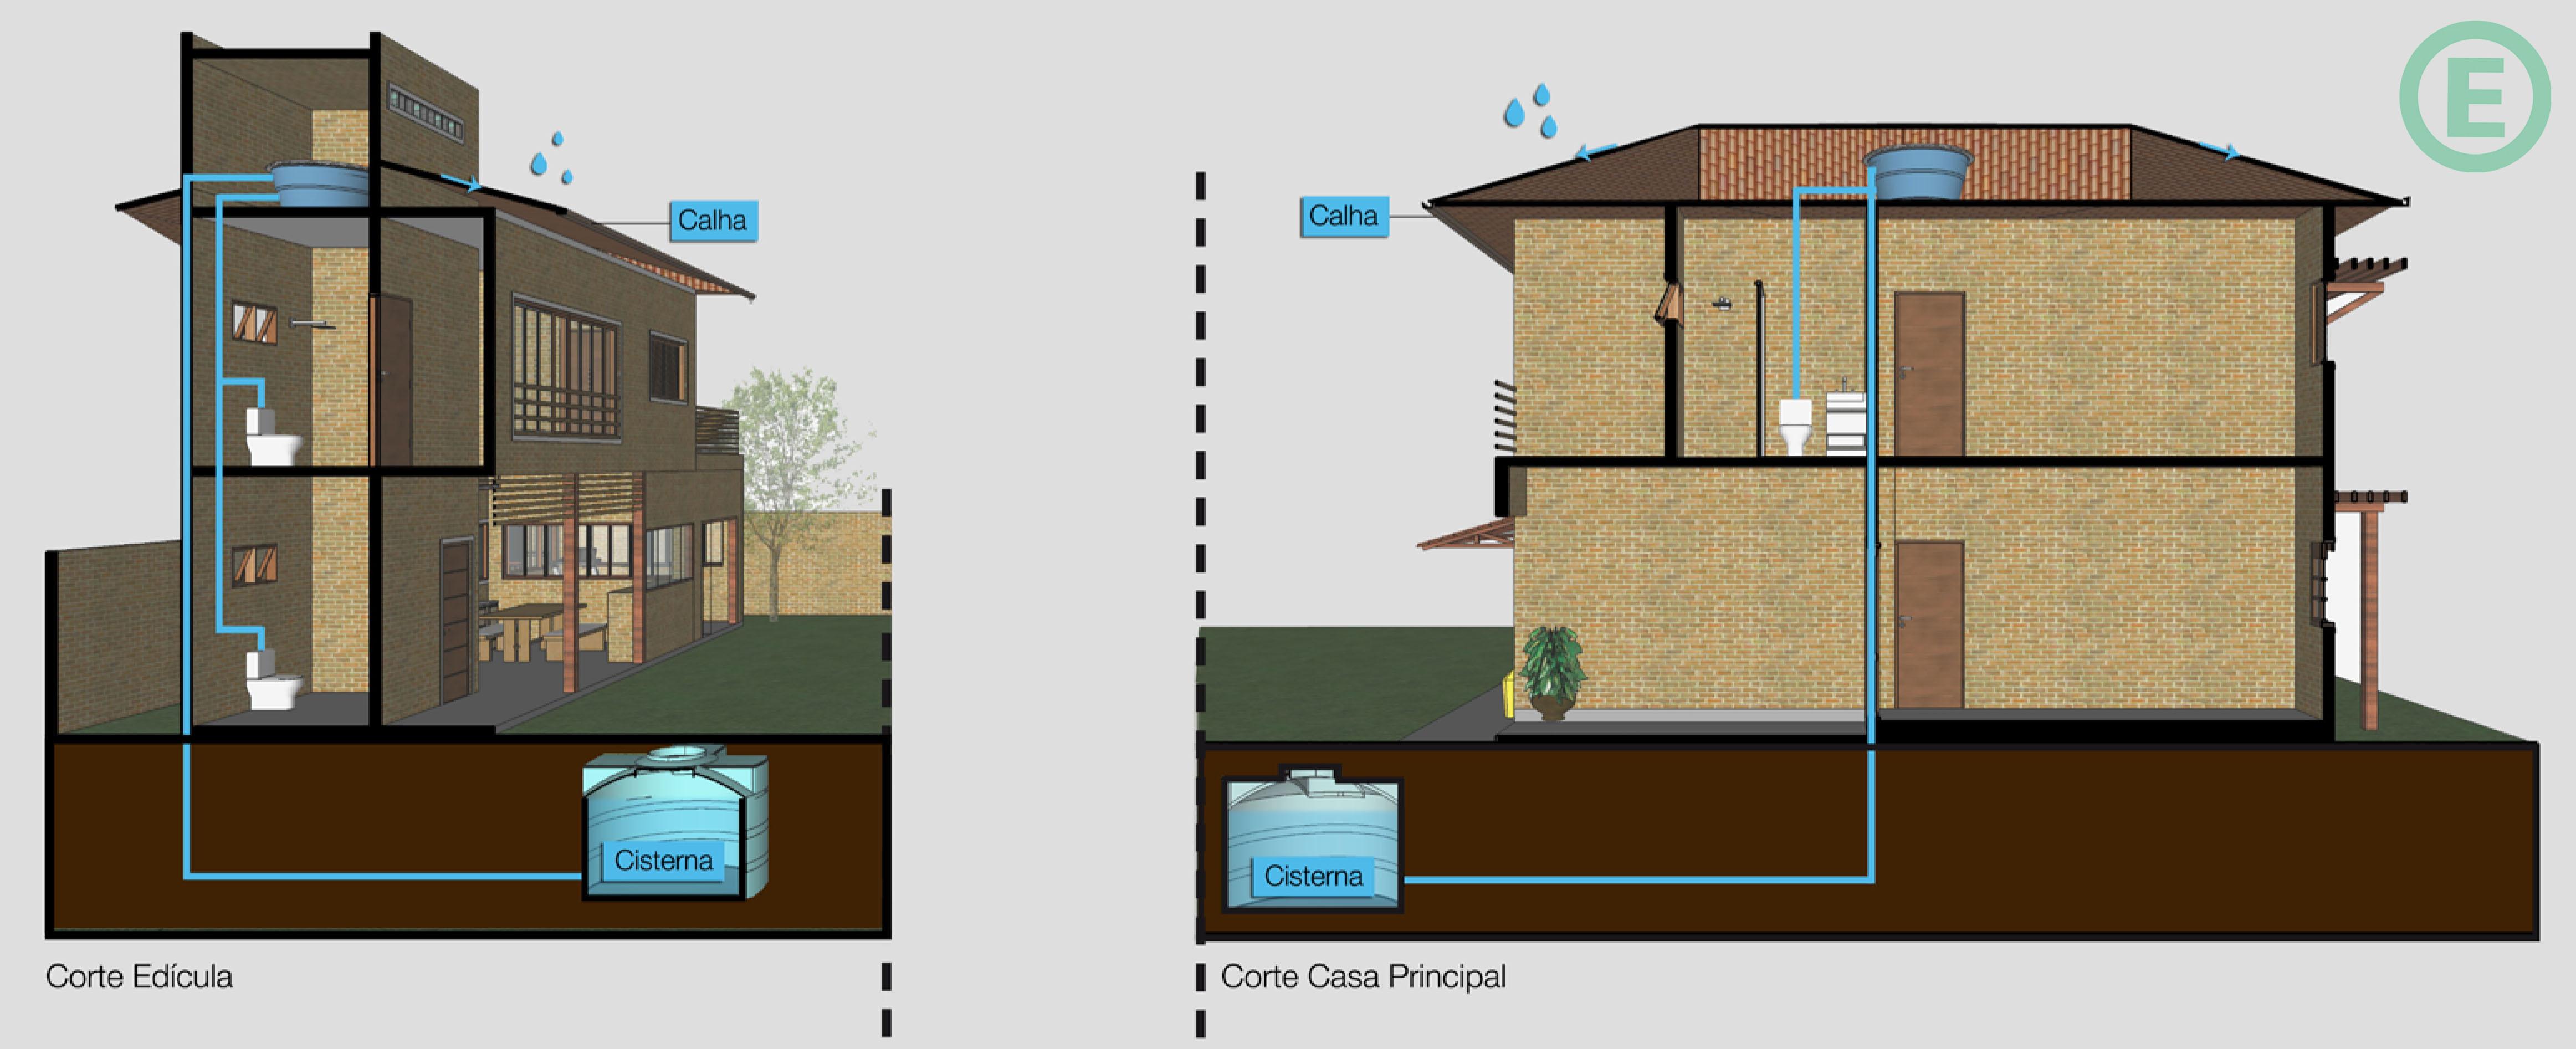 arquitetura-sustentavel-captacao-agua-chuva